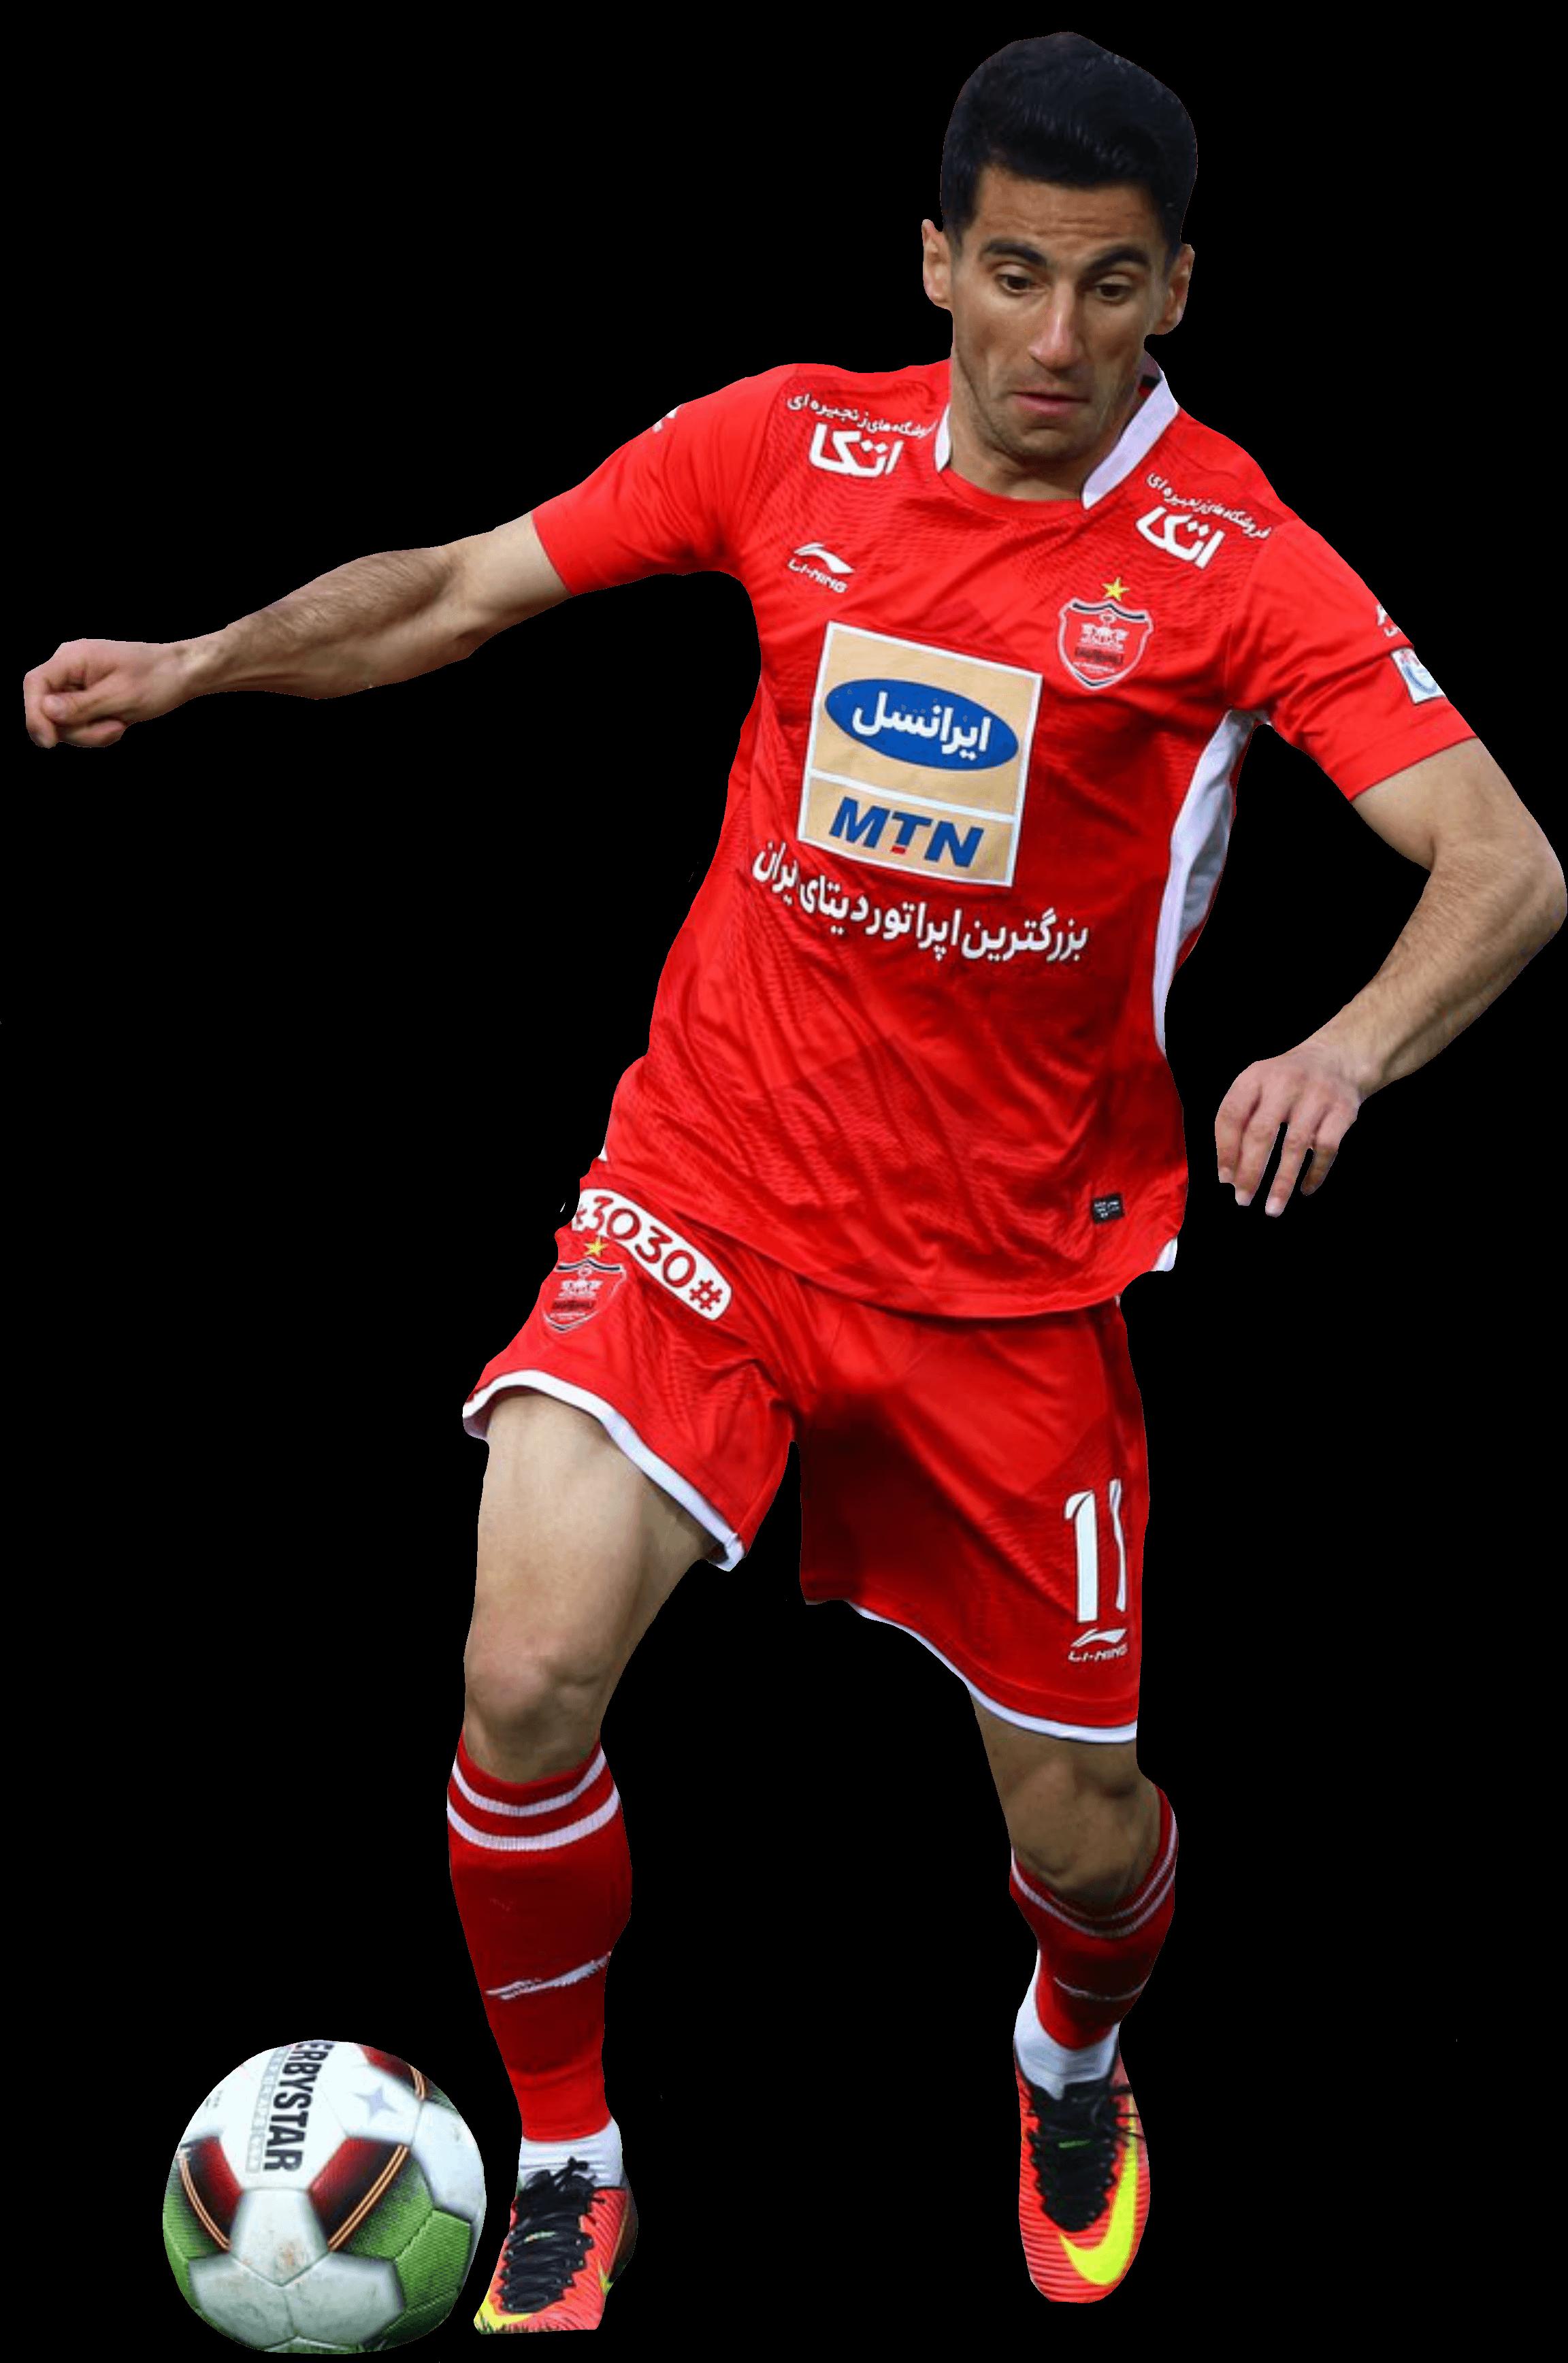 Mehdi Shirirender